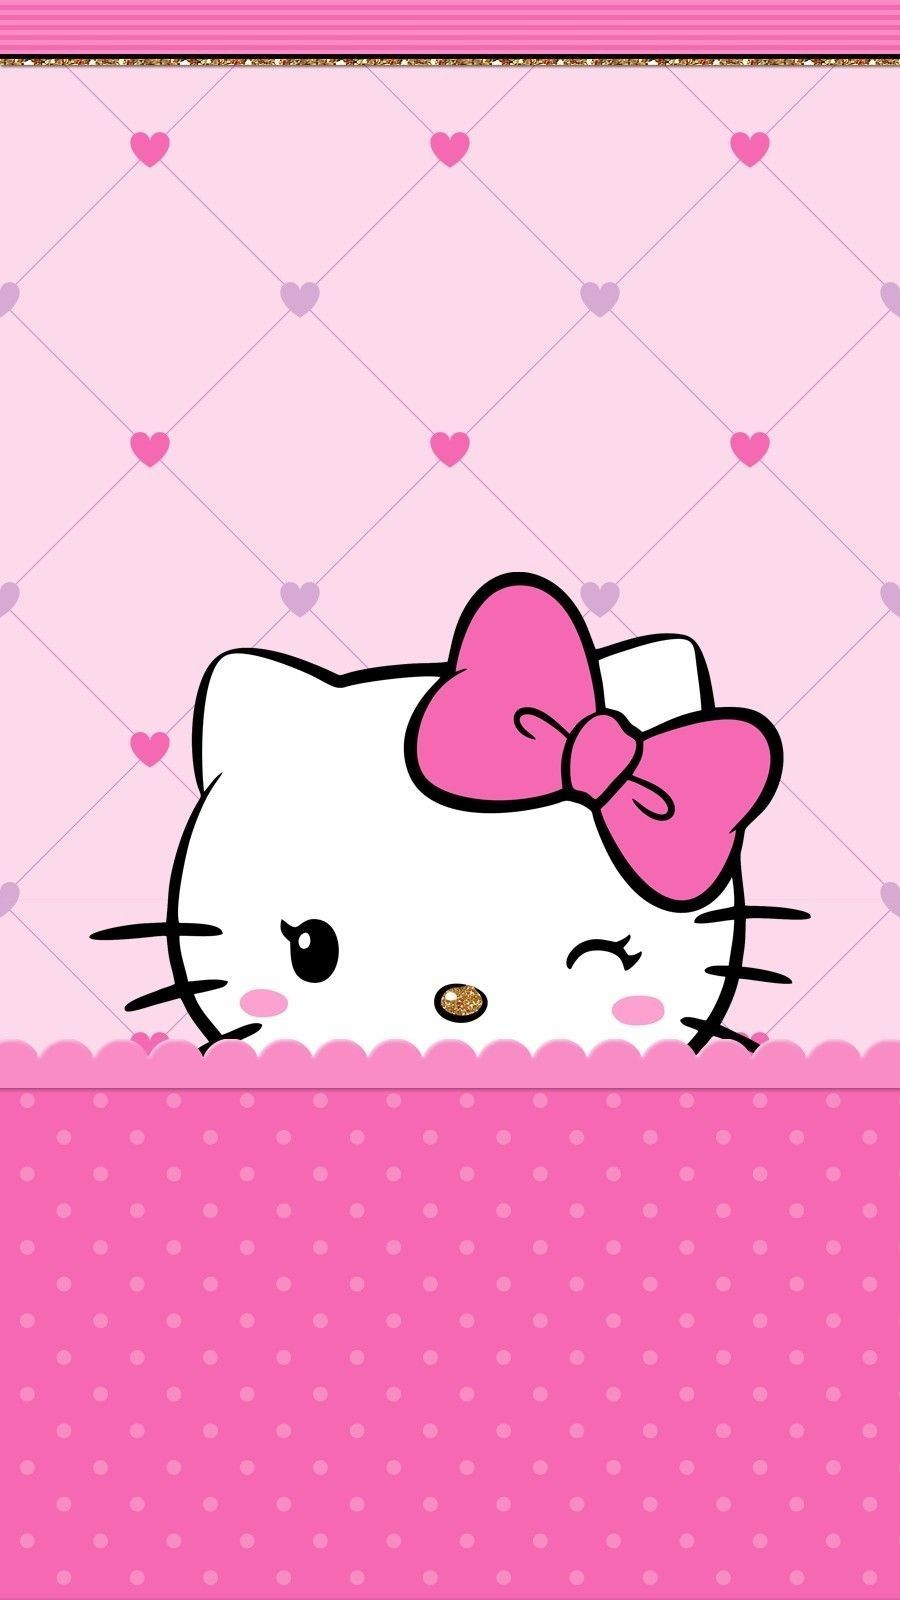 Pin Oleh Patrice Aka Pepper Di Hello Kitty Wallpapers Hello